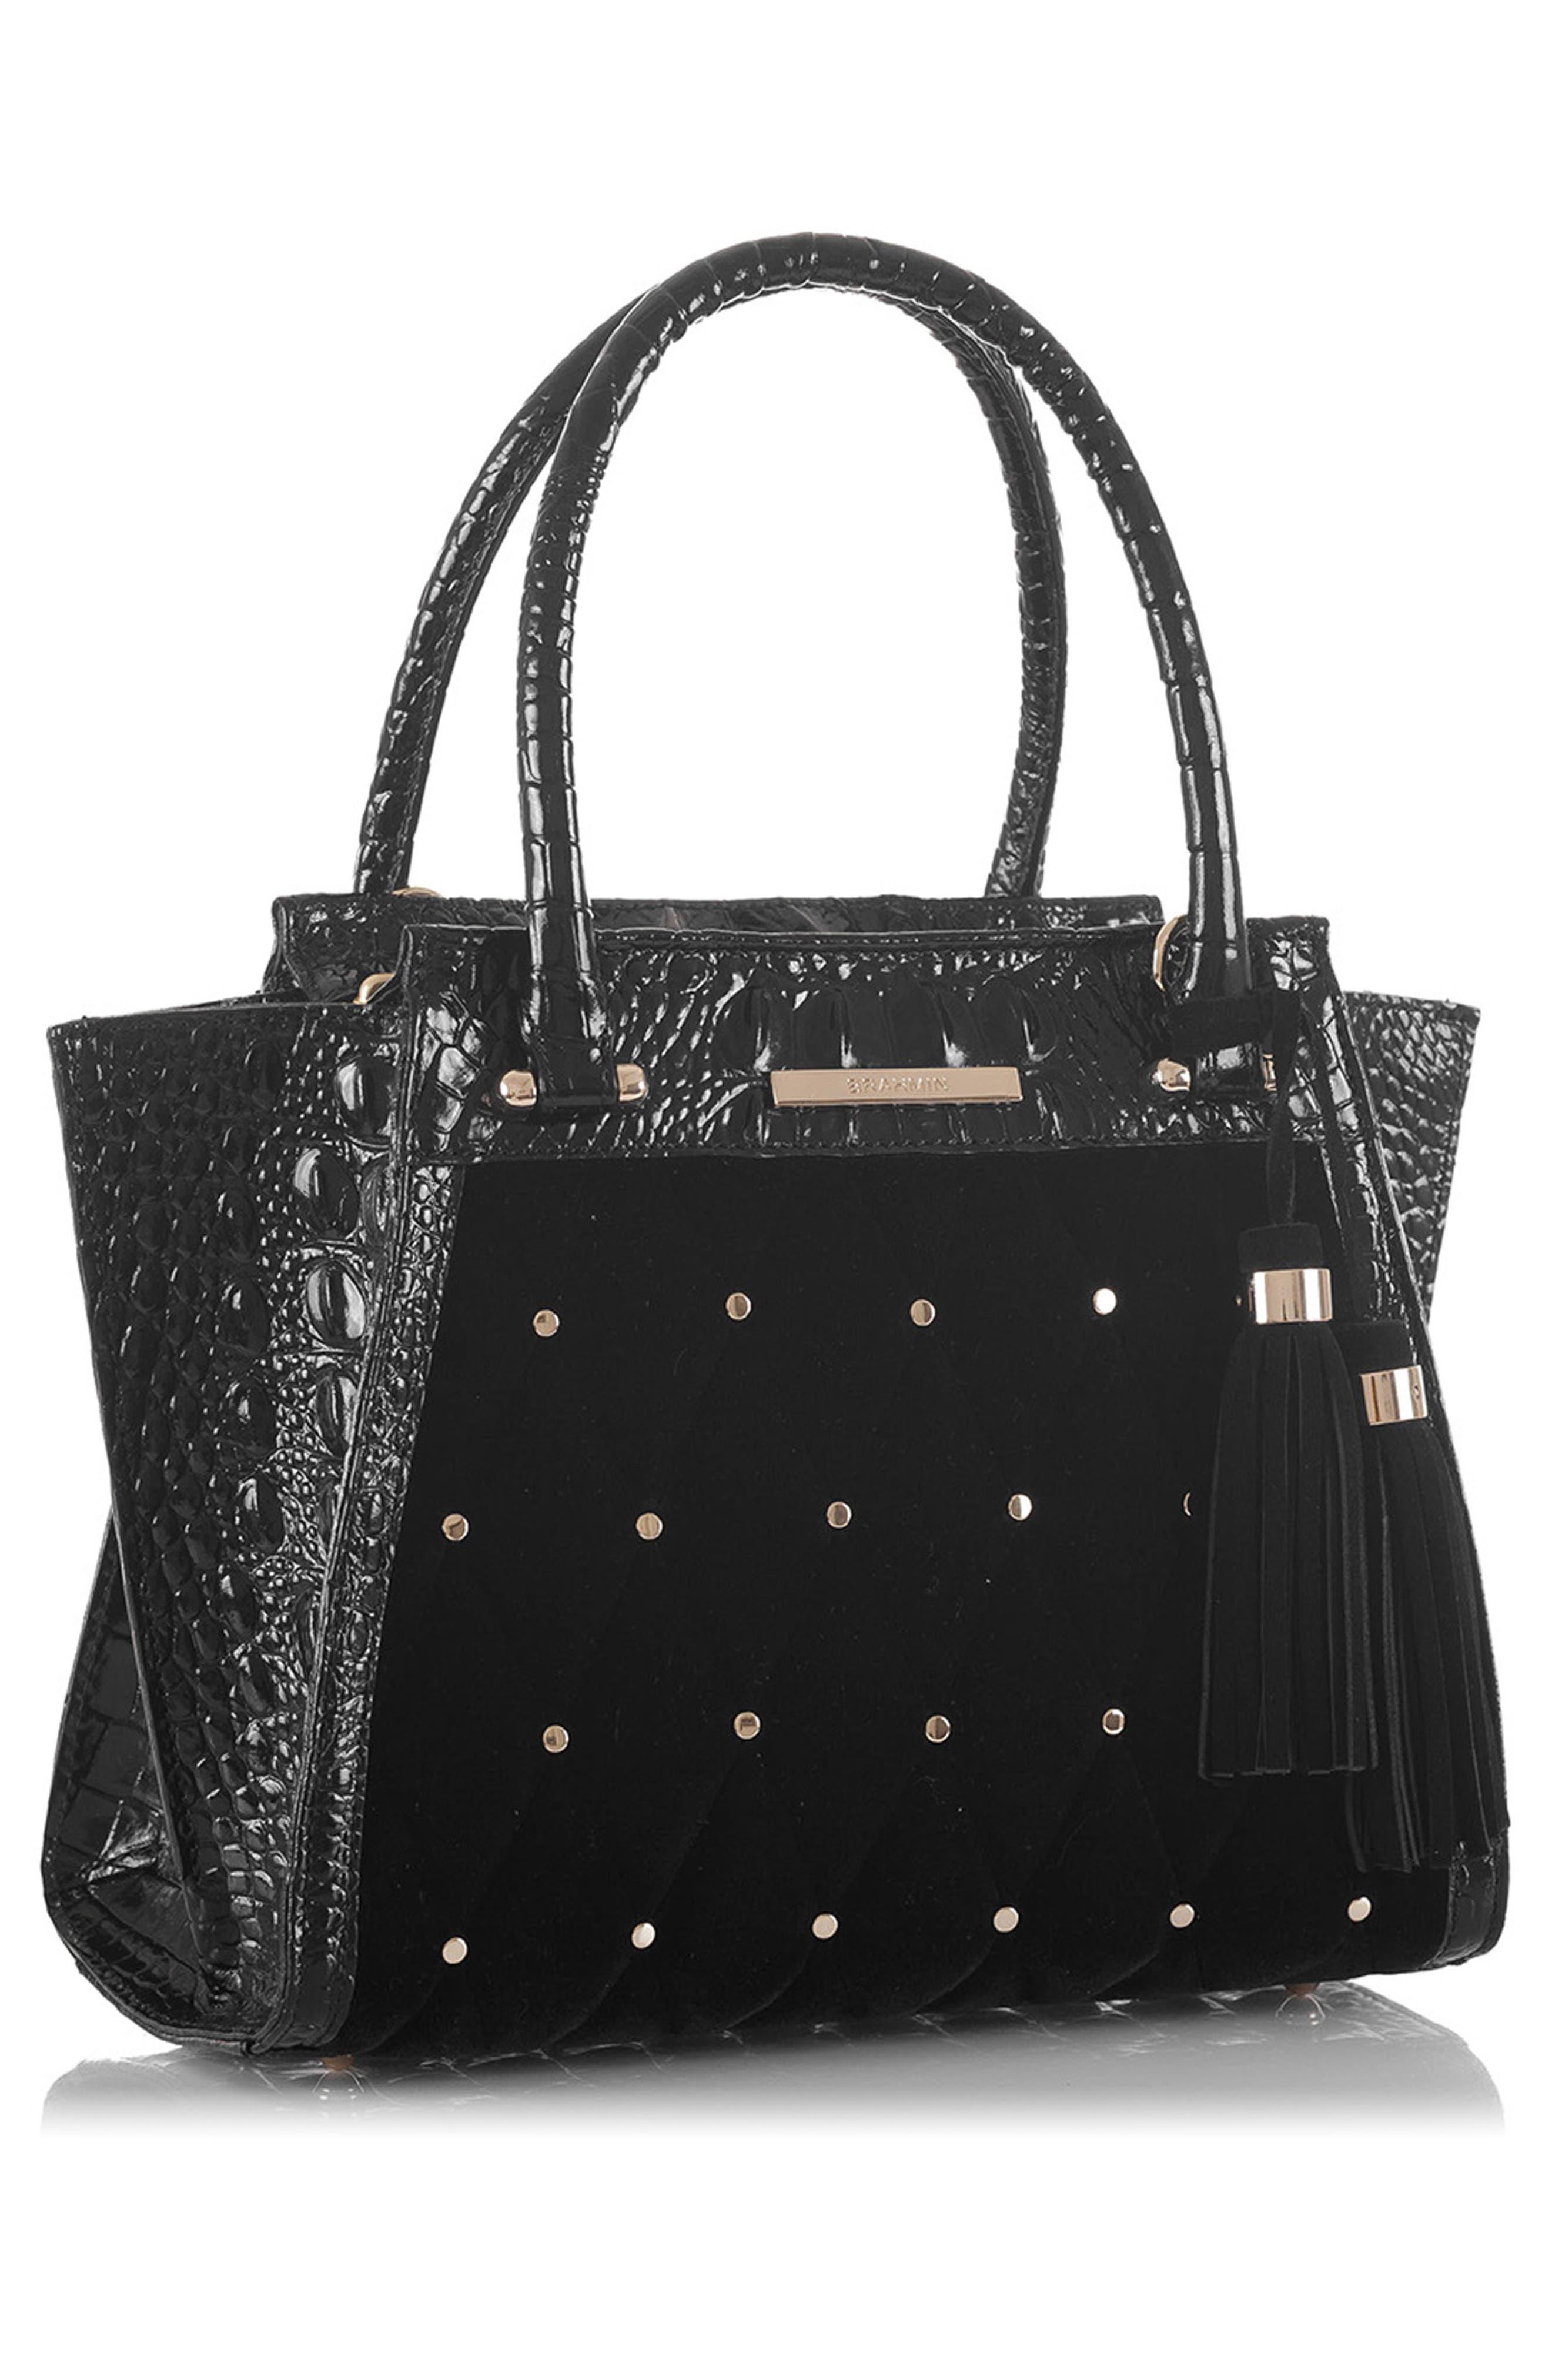 BRAHMIN, Mini Priscilla Studded Suede & Leather Satchel, Alternate thumbnail 4, color, BLACK